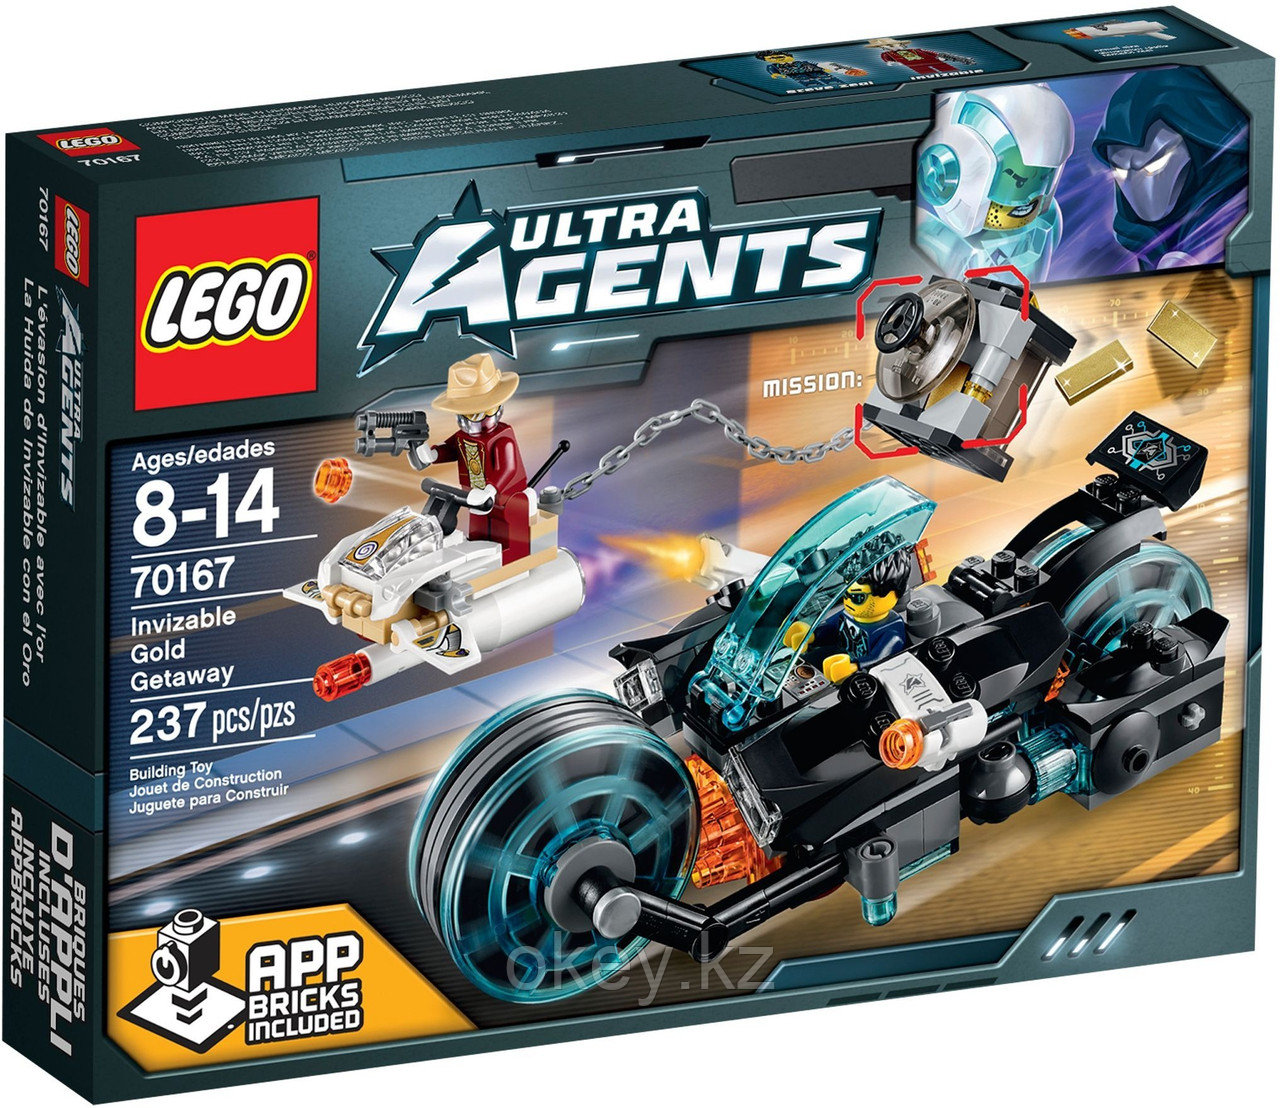 LEGO Ultra Agents: Похищение золота 70167